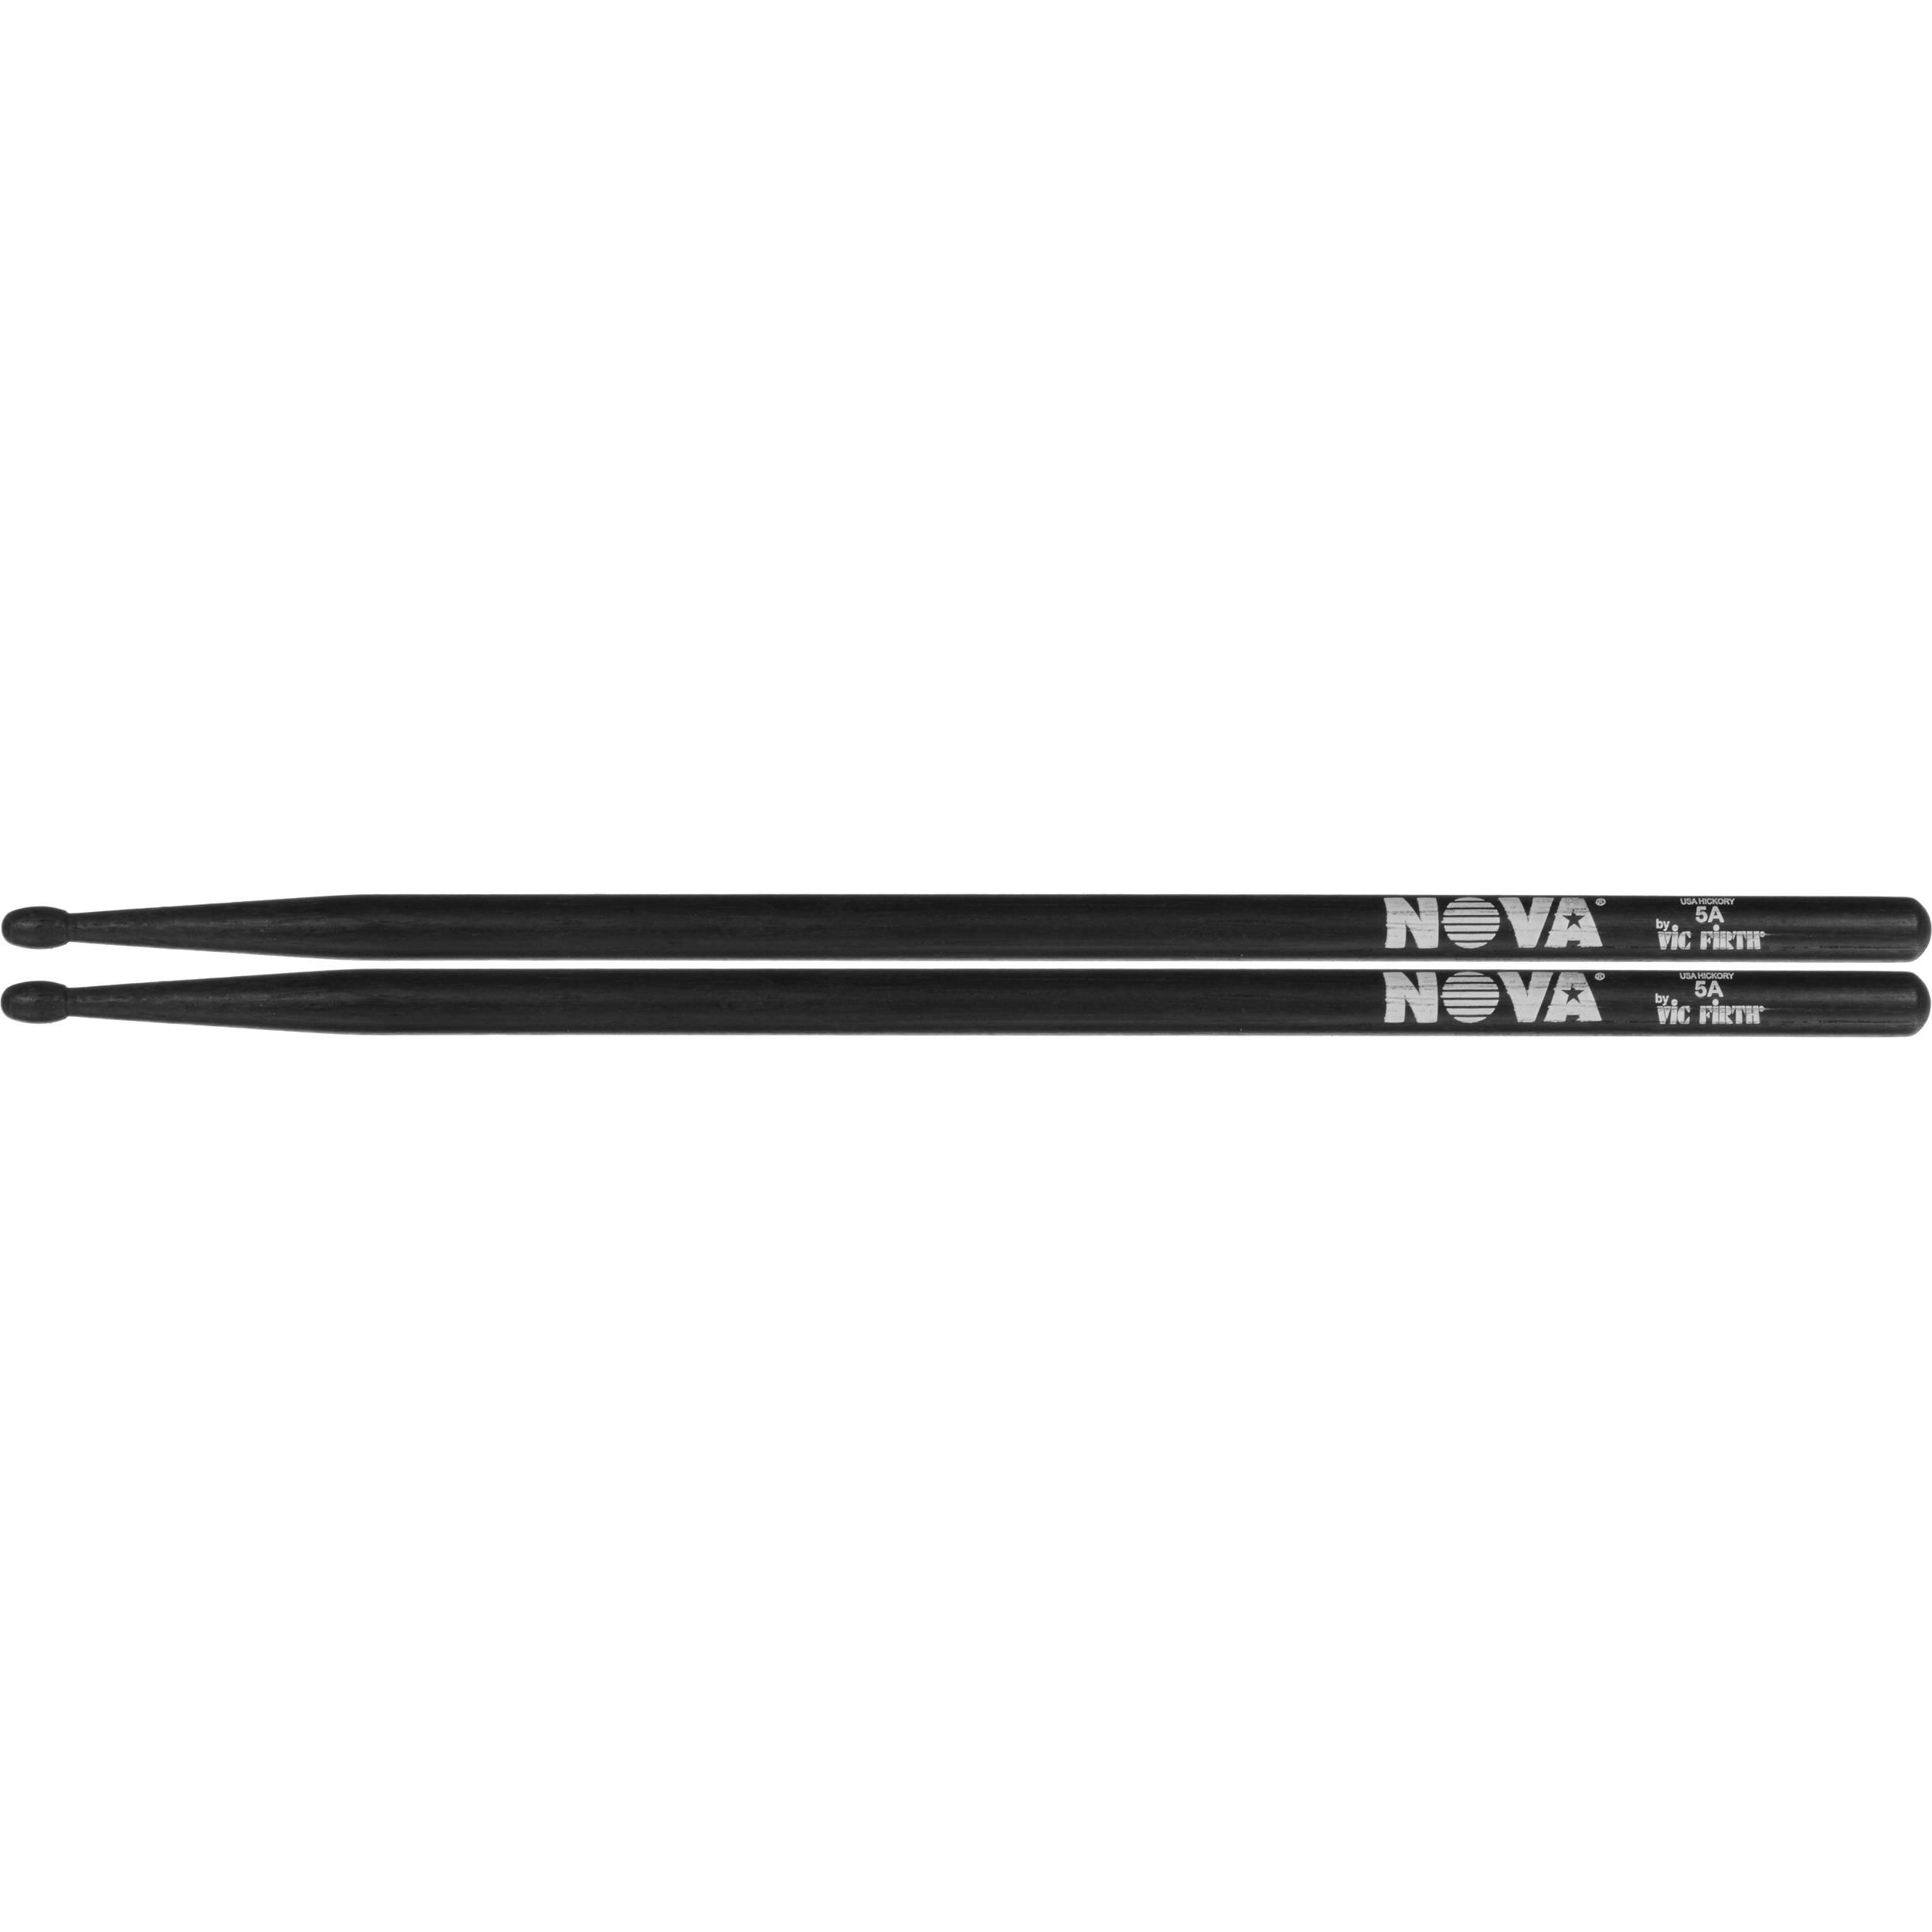 Vic Firth Nova Drumsticks 5AB schwarz lackiertNeu